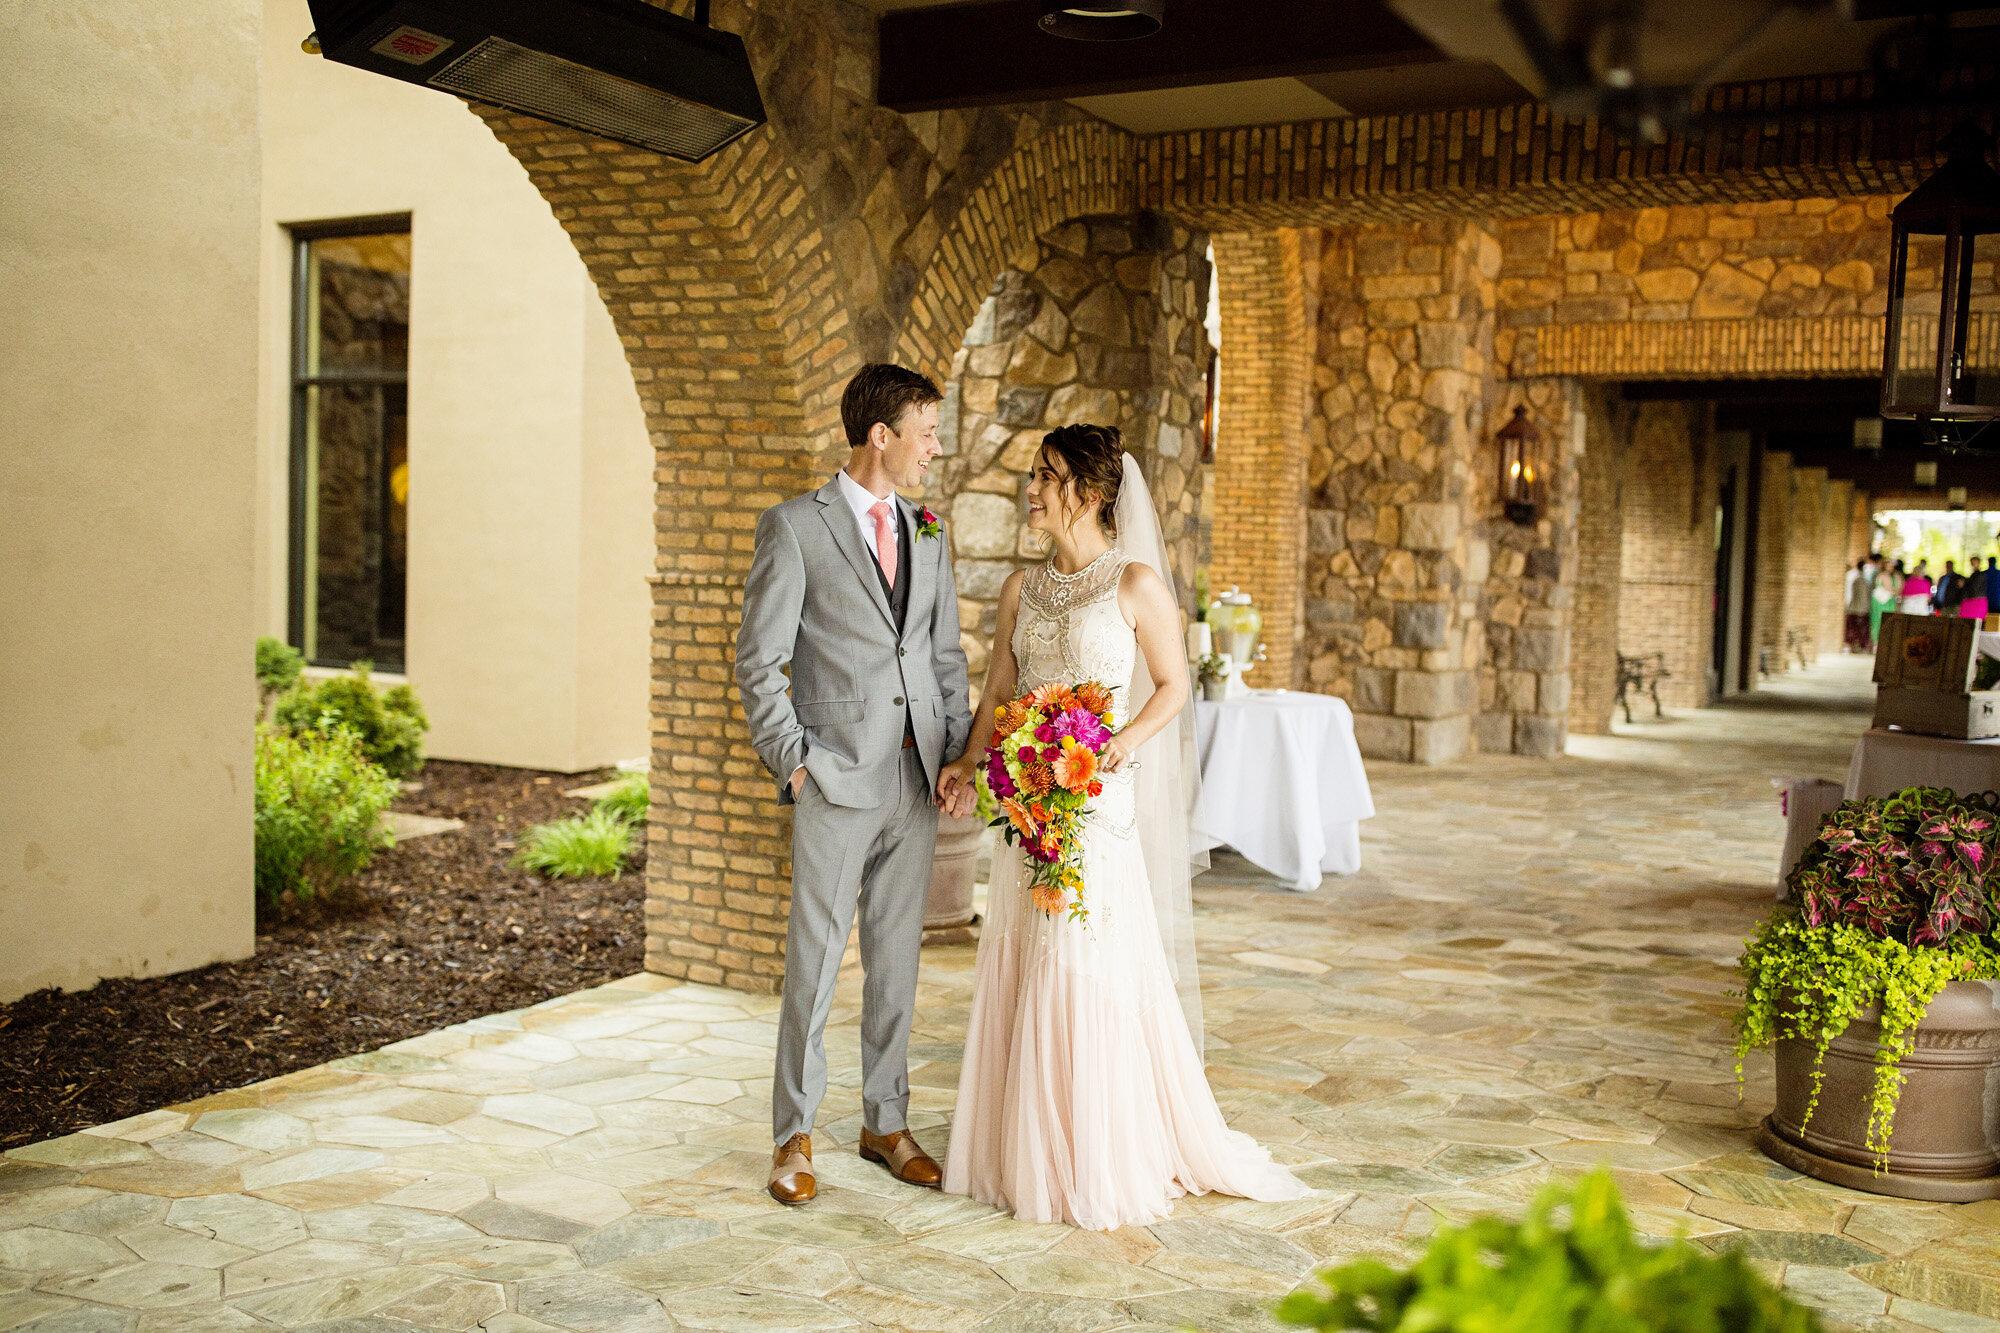 Seriously_Sabrina_Photography_Colorado_Springs_Club_at_Flying_Horse_Destination_Wedding_ODwyer28.jpg